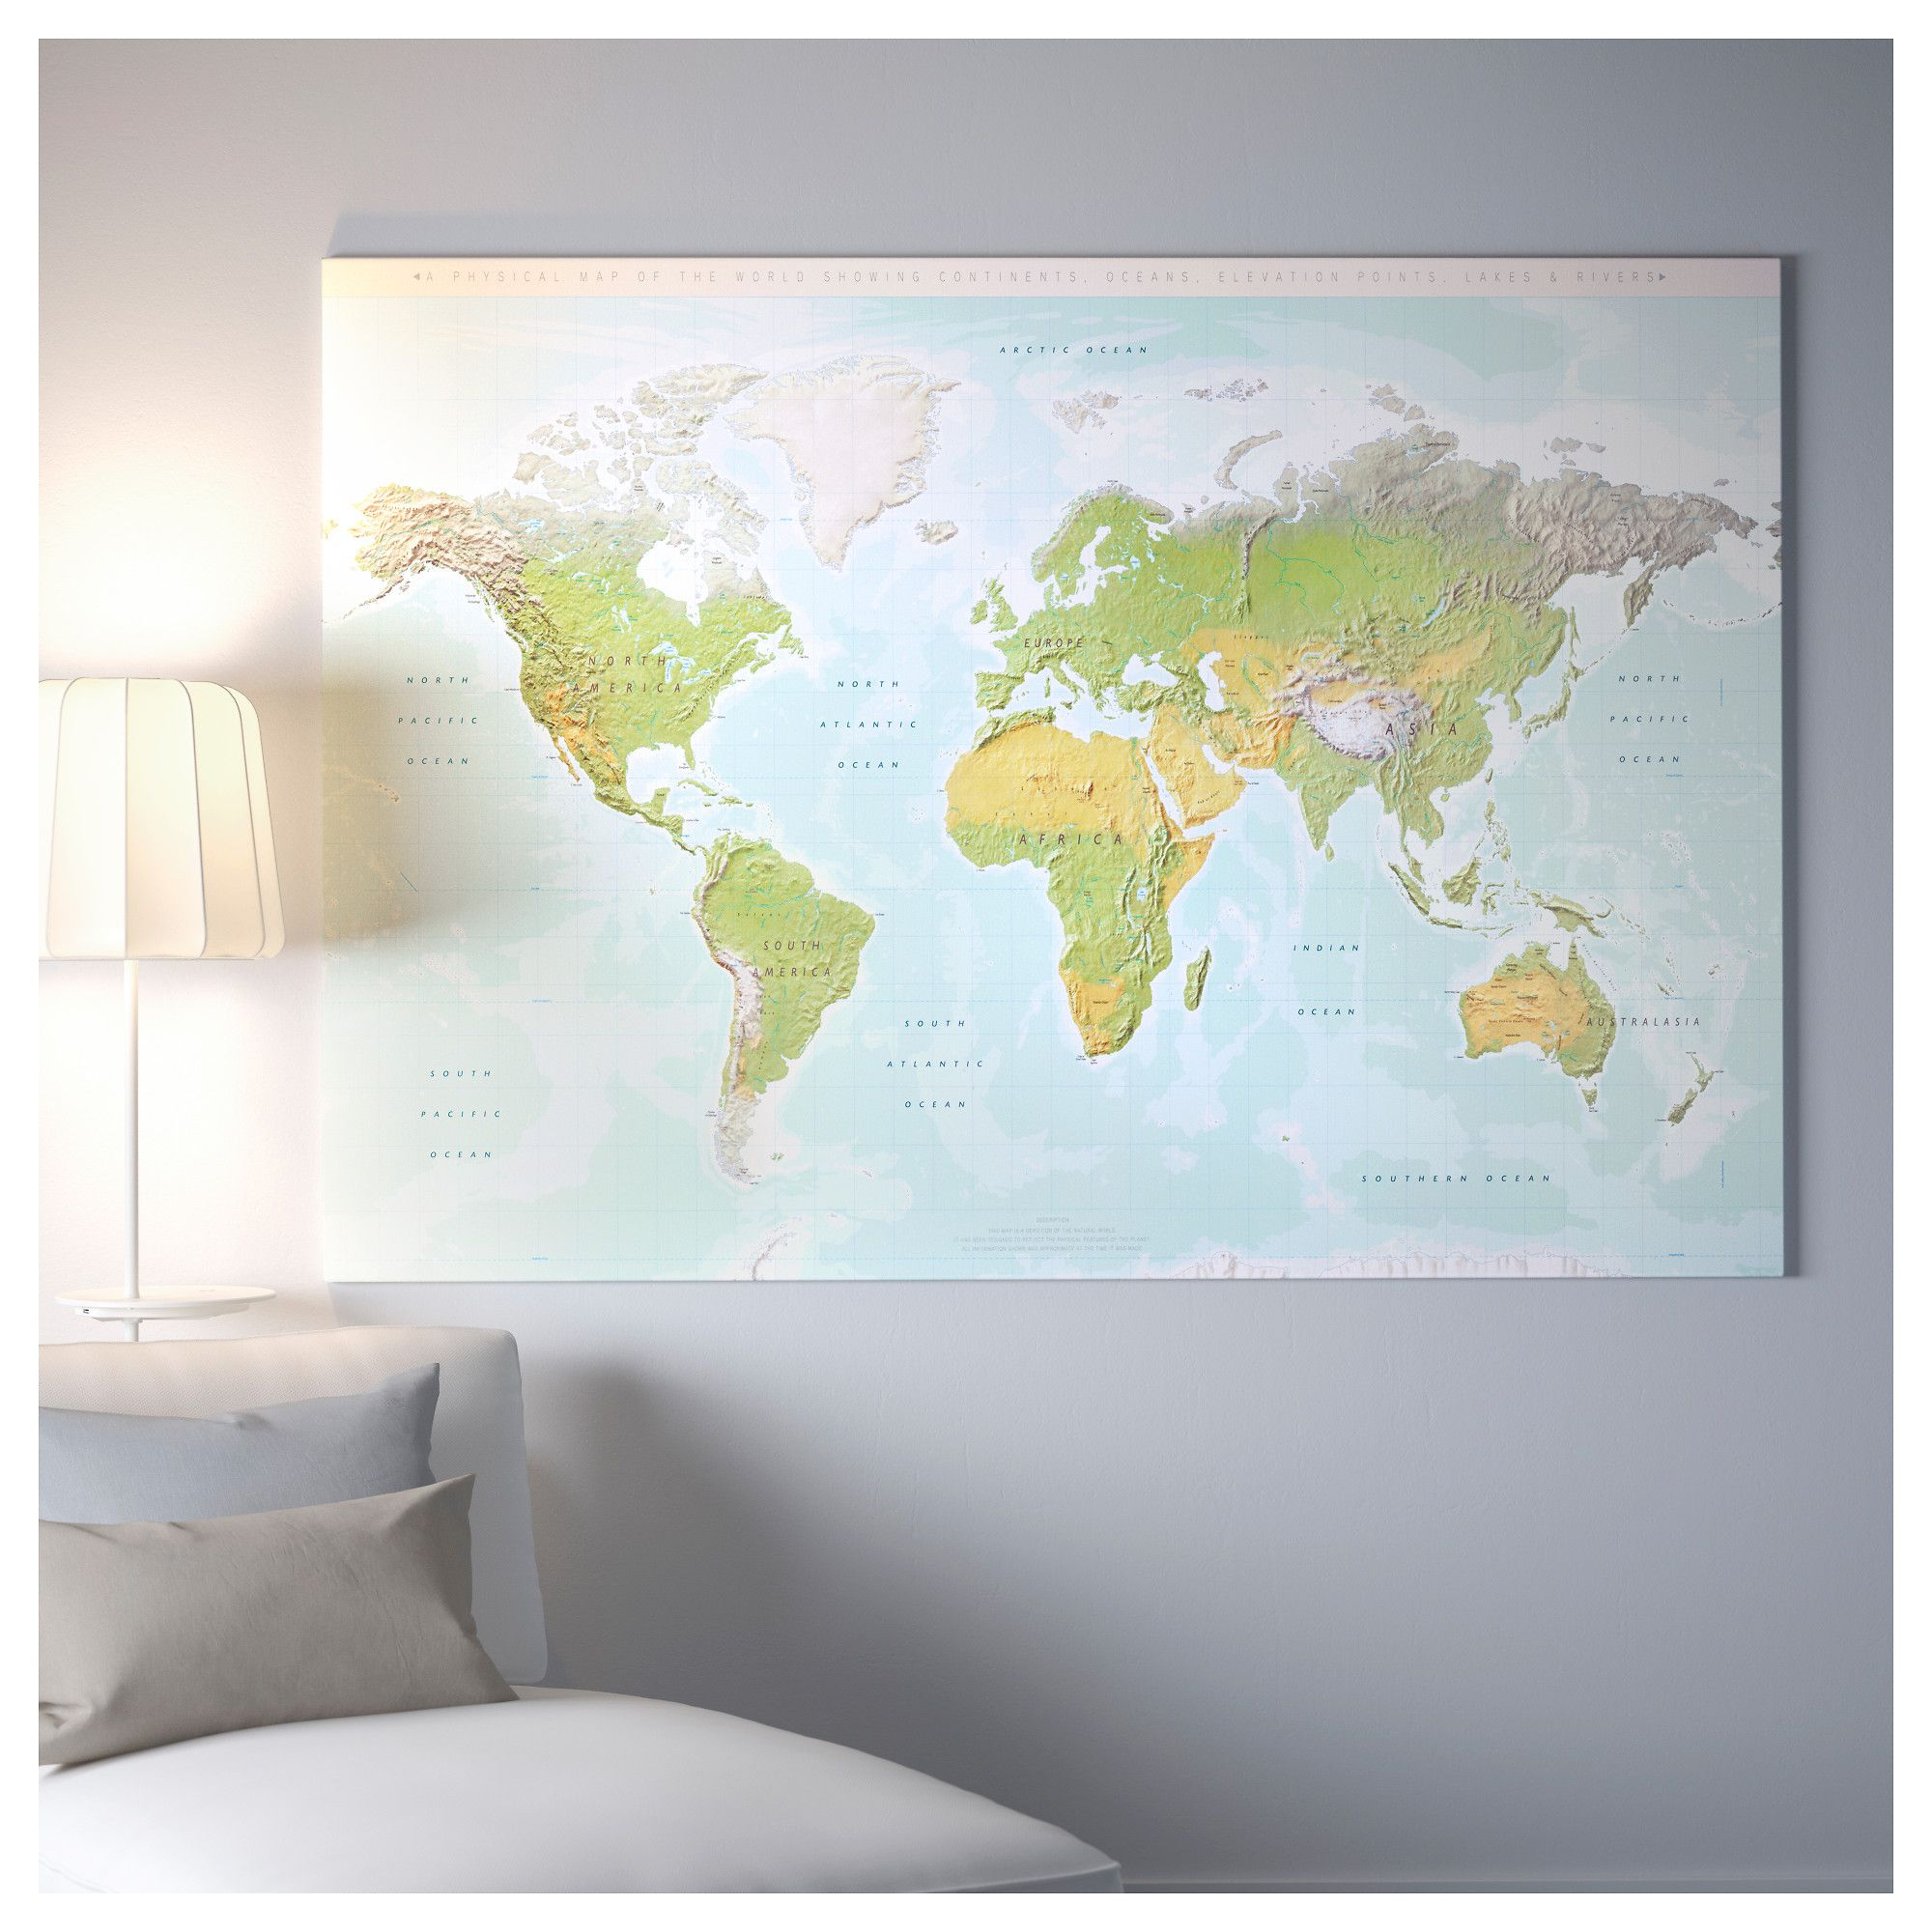 BJORKSTA πίνακας, αλουμινίου, Πίνακες | Φτιάχνοντας ένα σπίτι | Ikea ...